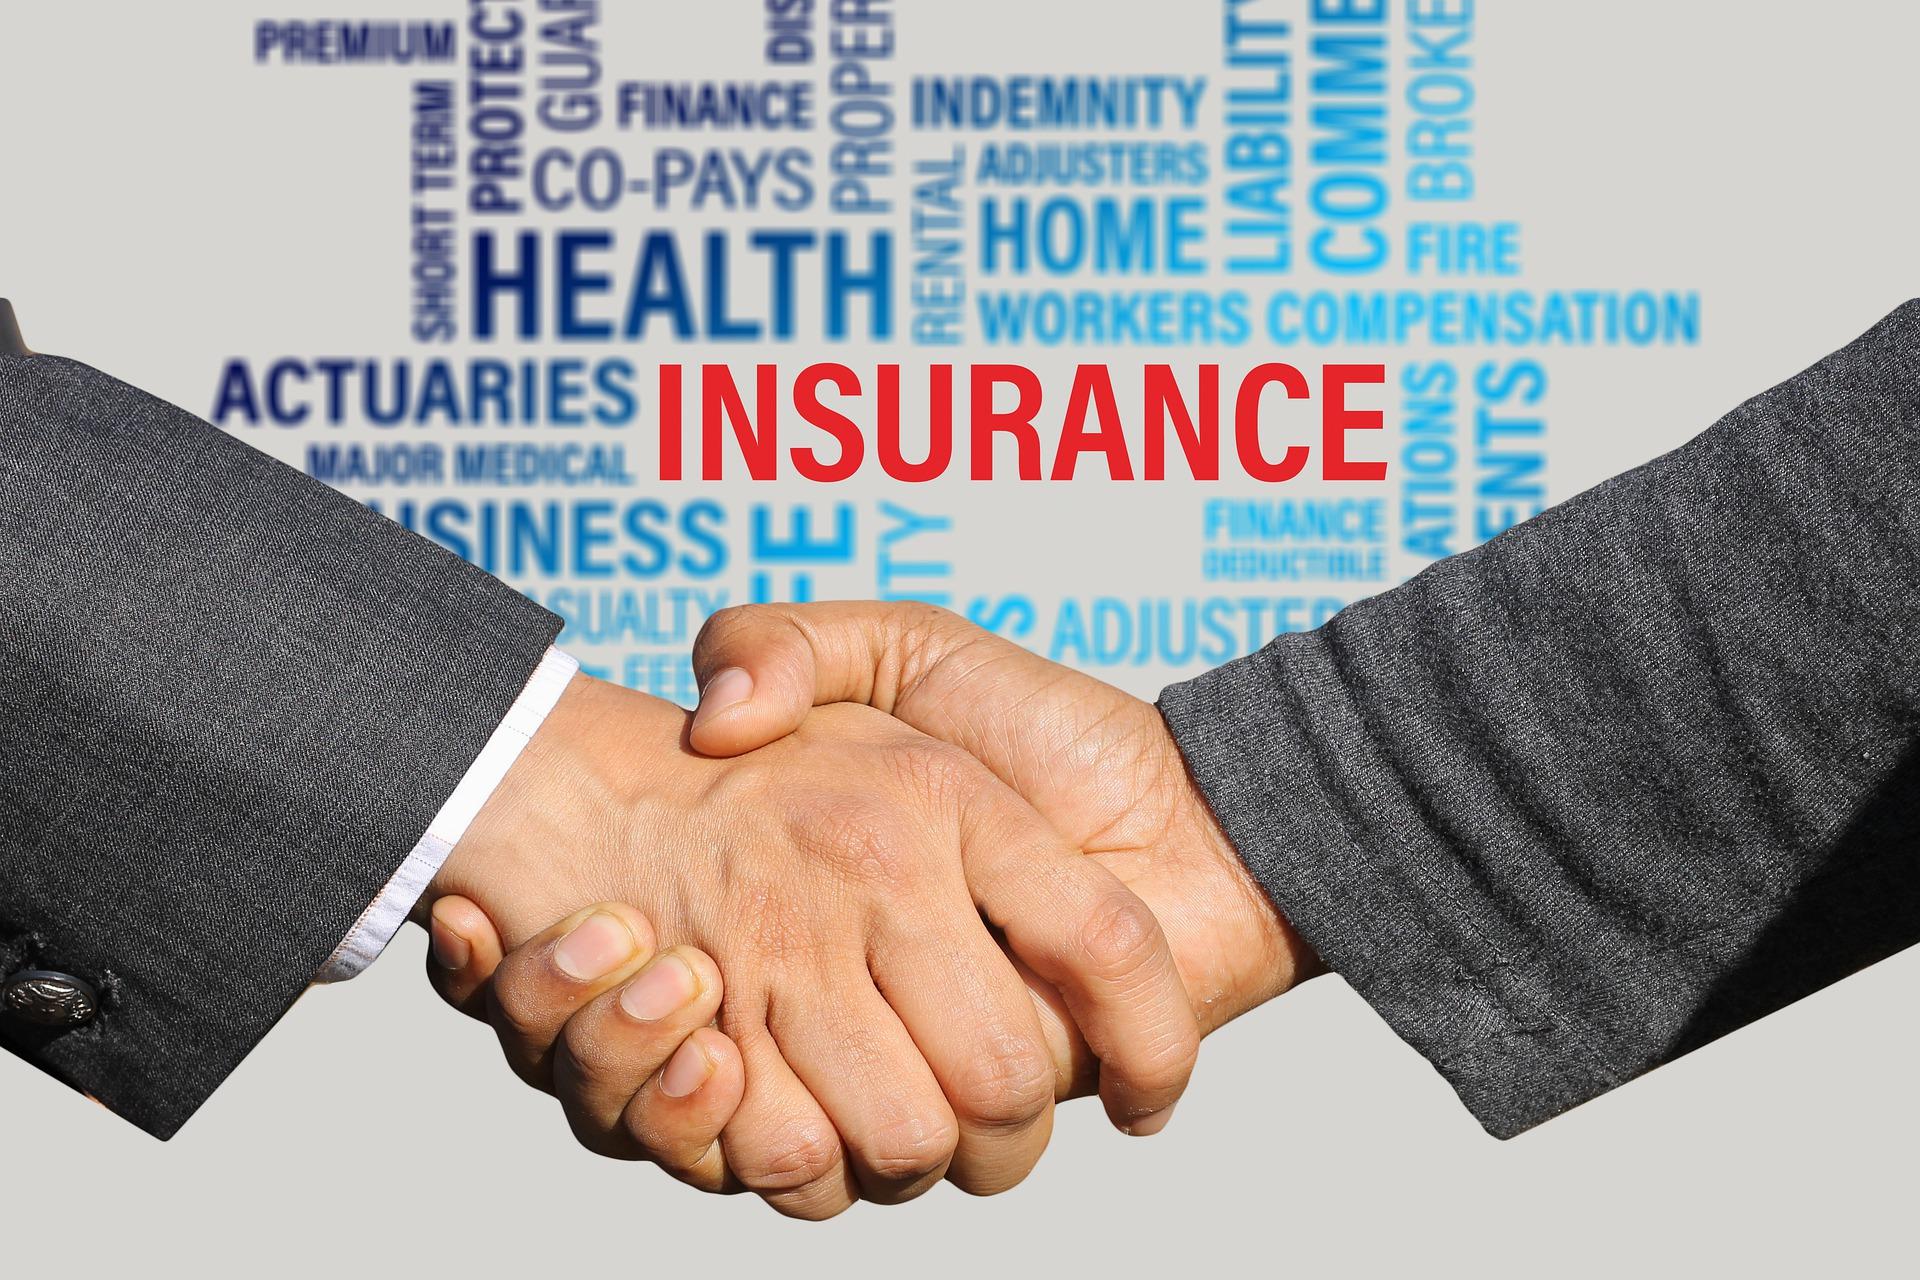 insurance-3113180_1920